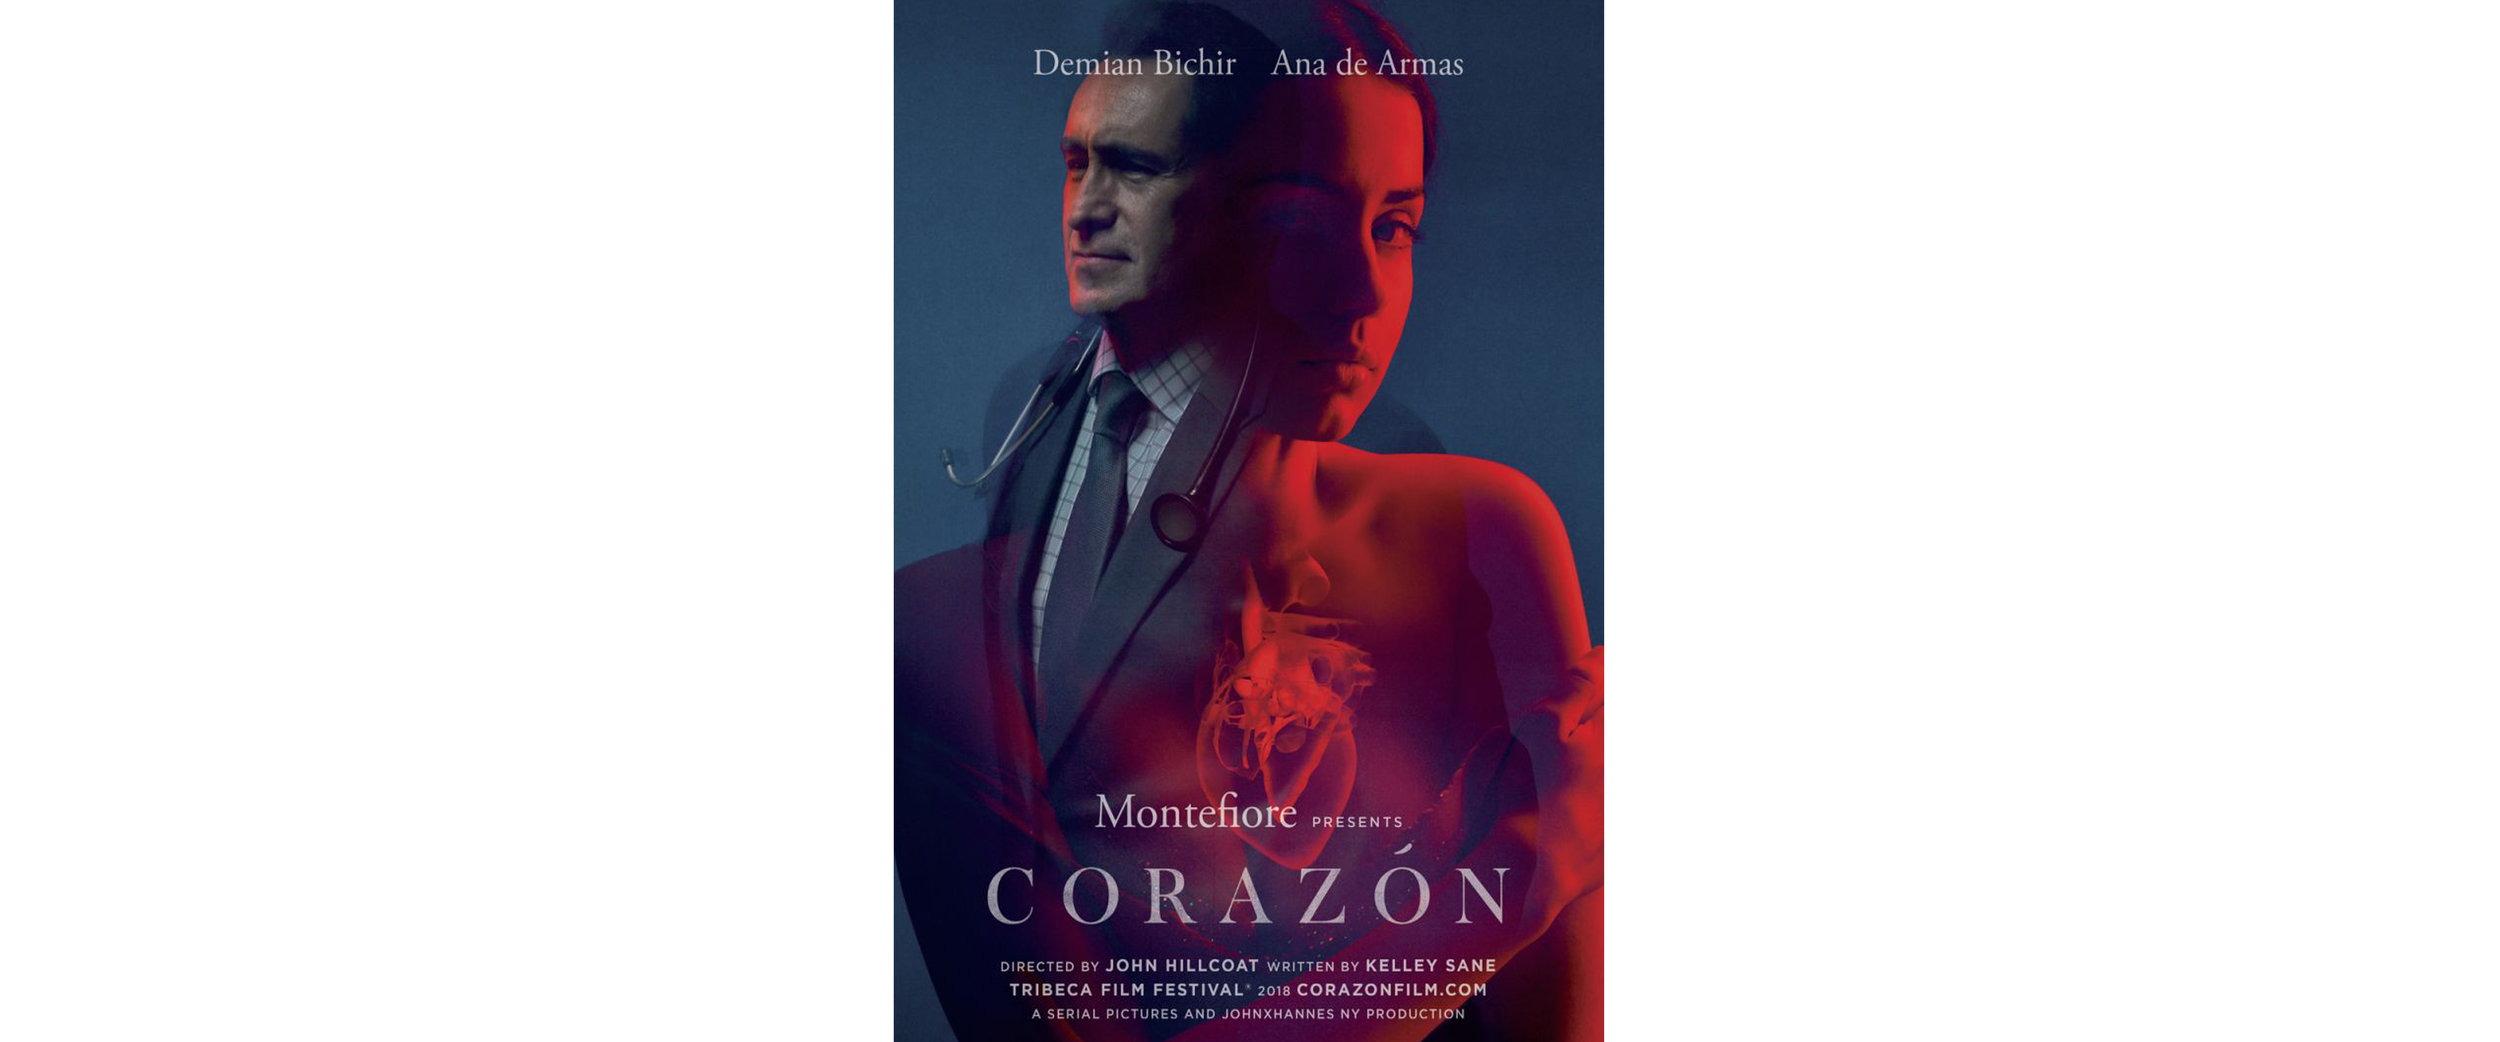 Corazon_2.jpg